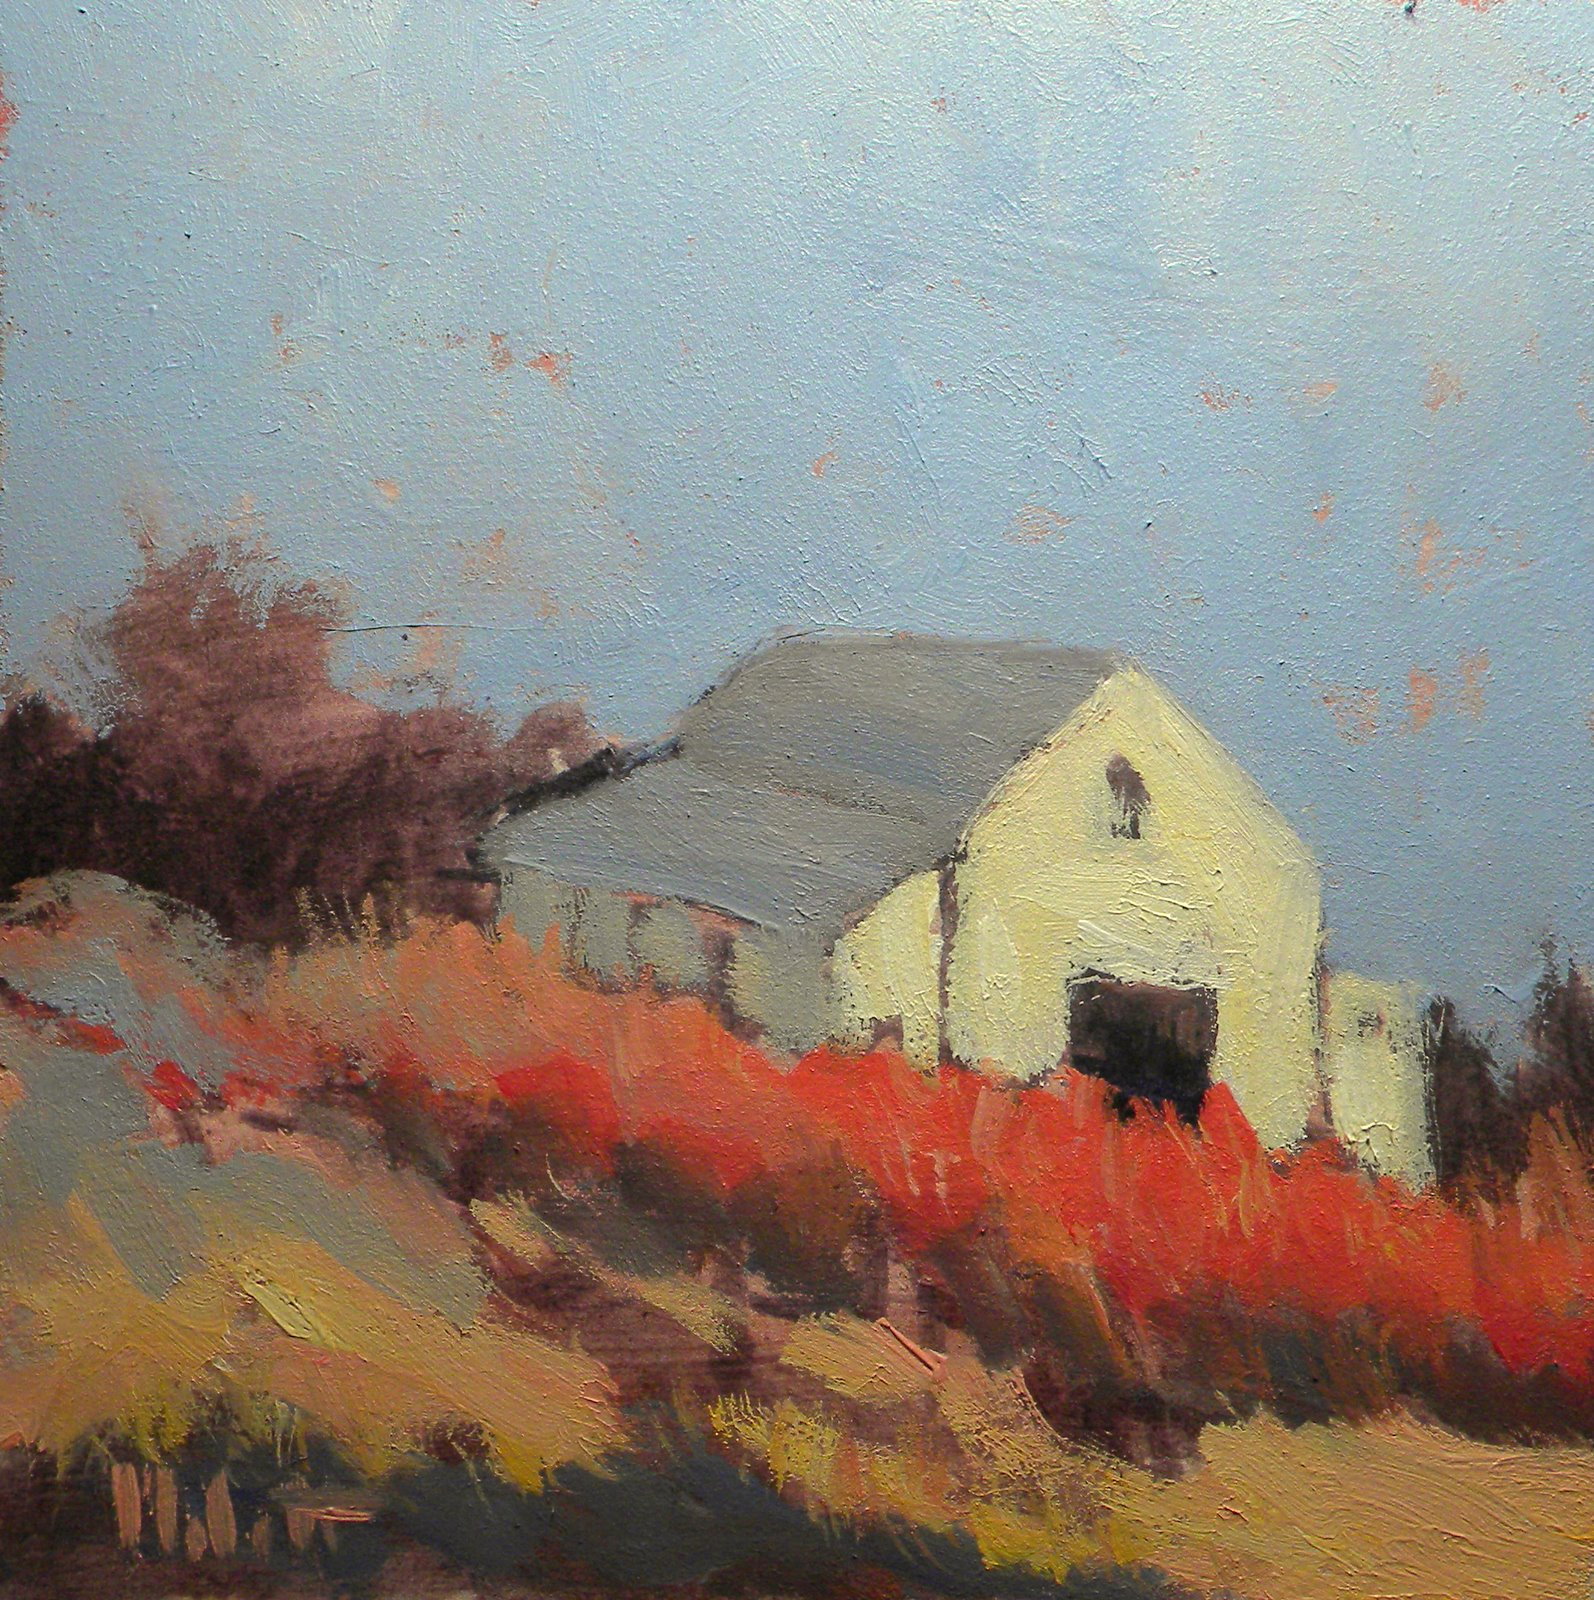 ... Malott Original Paintings: White Barn Autumn Landscape Oil Painting